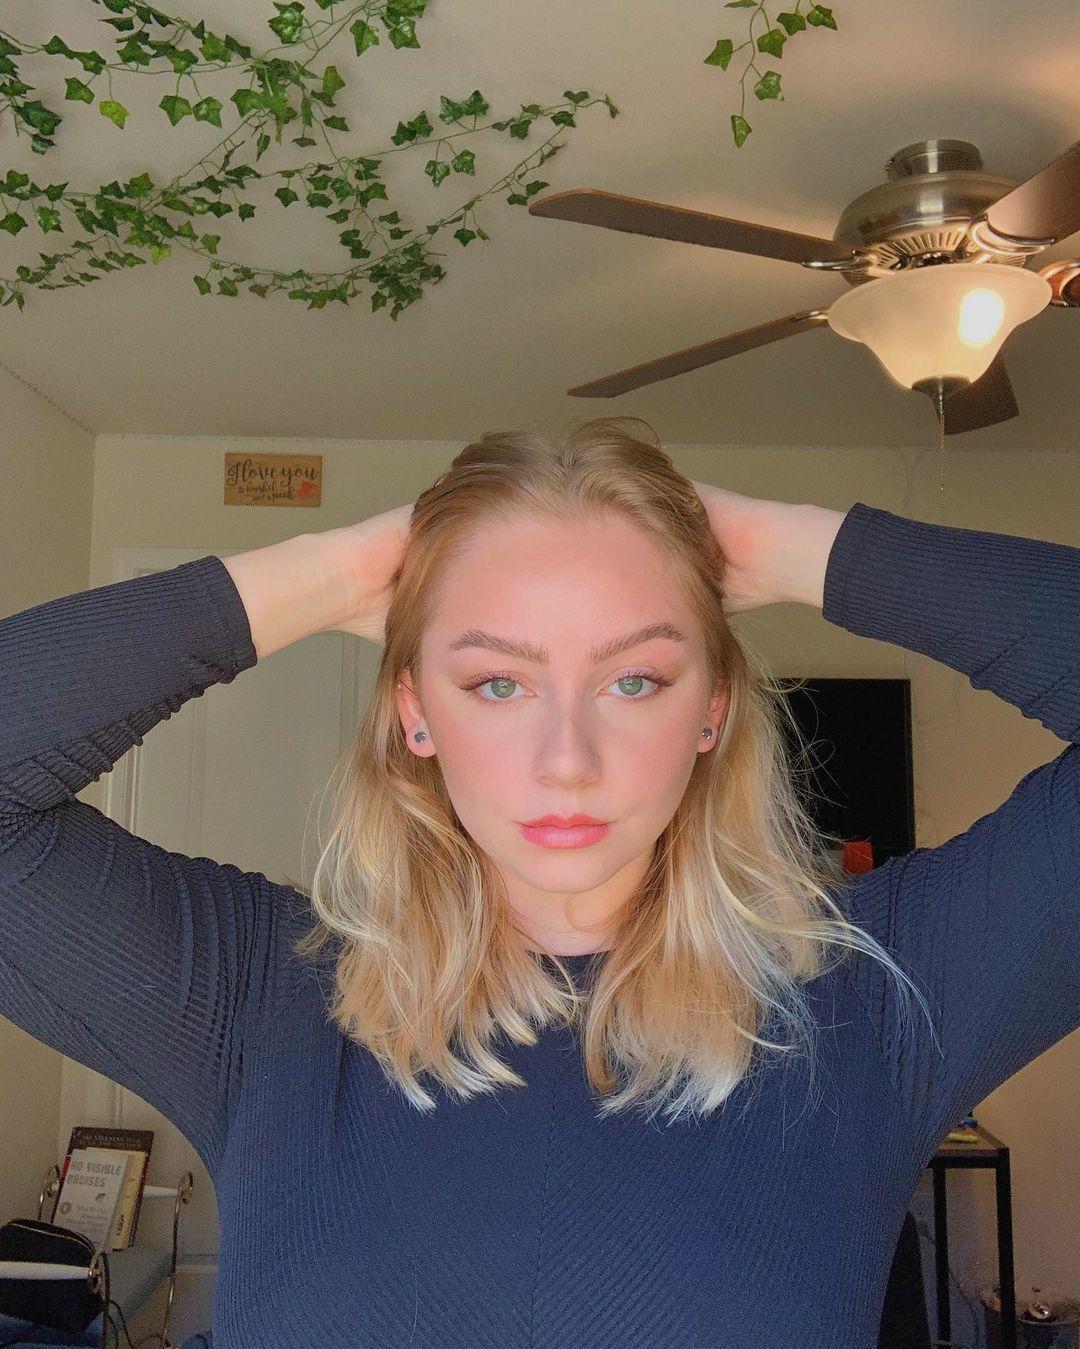 Hannah-Joarnold-Wallpapers-Insta-Fit-Bio-hannahjo-Wallpapers-Insta-Fit-Bio-13